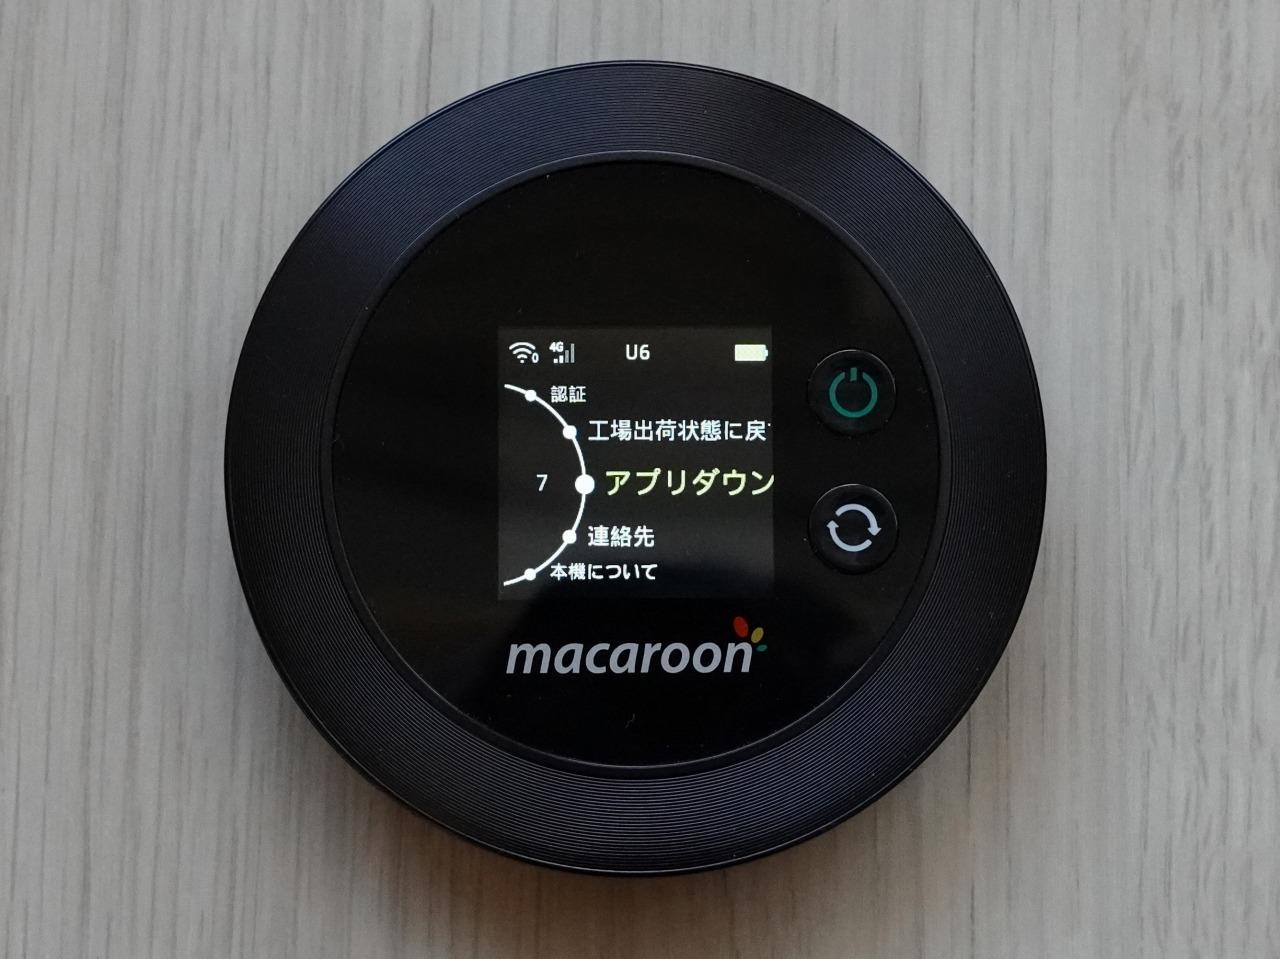 Macaroon M1 のアプリダウンロード画面